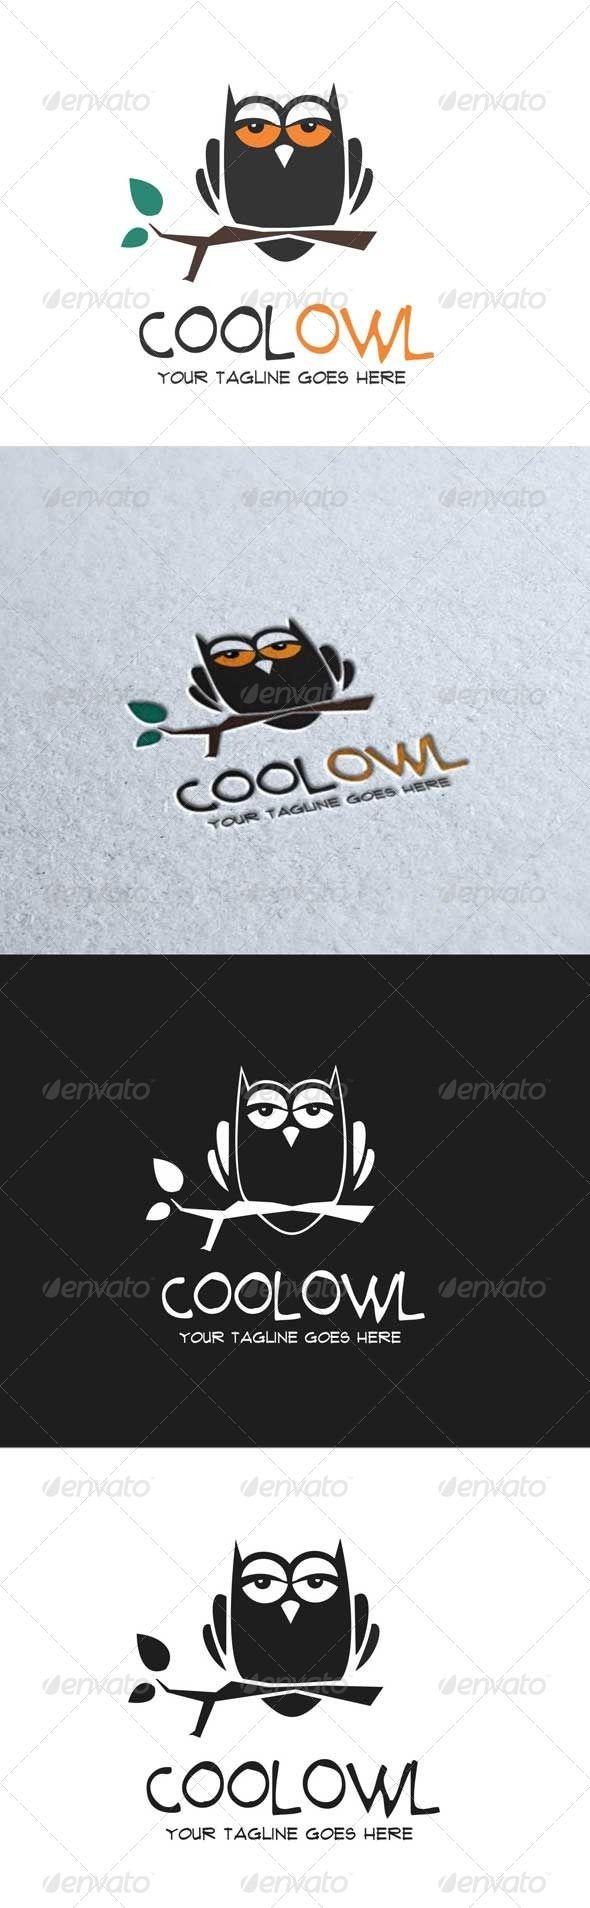 Cool Owl Logo GraphicRiver Cool Owl logo AI and EPS